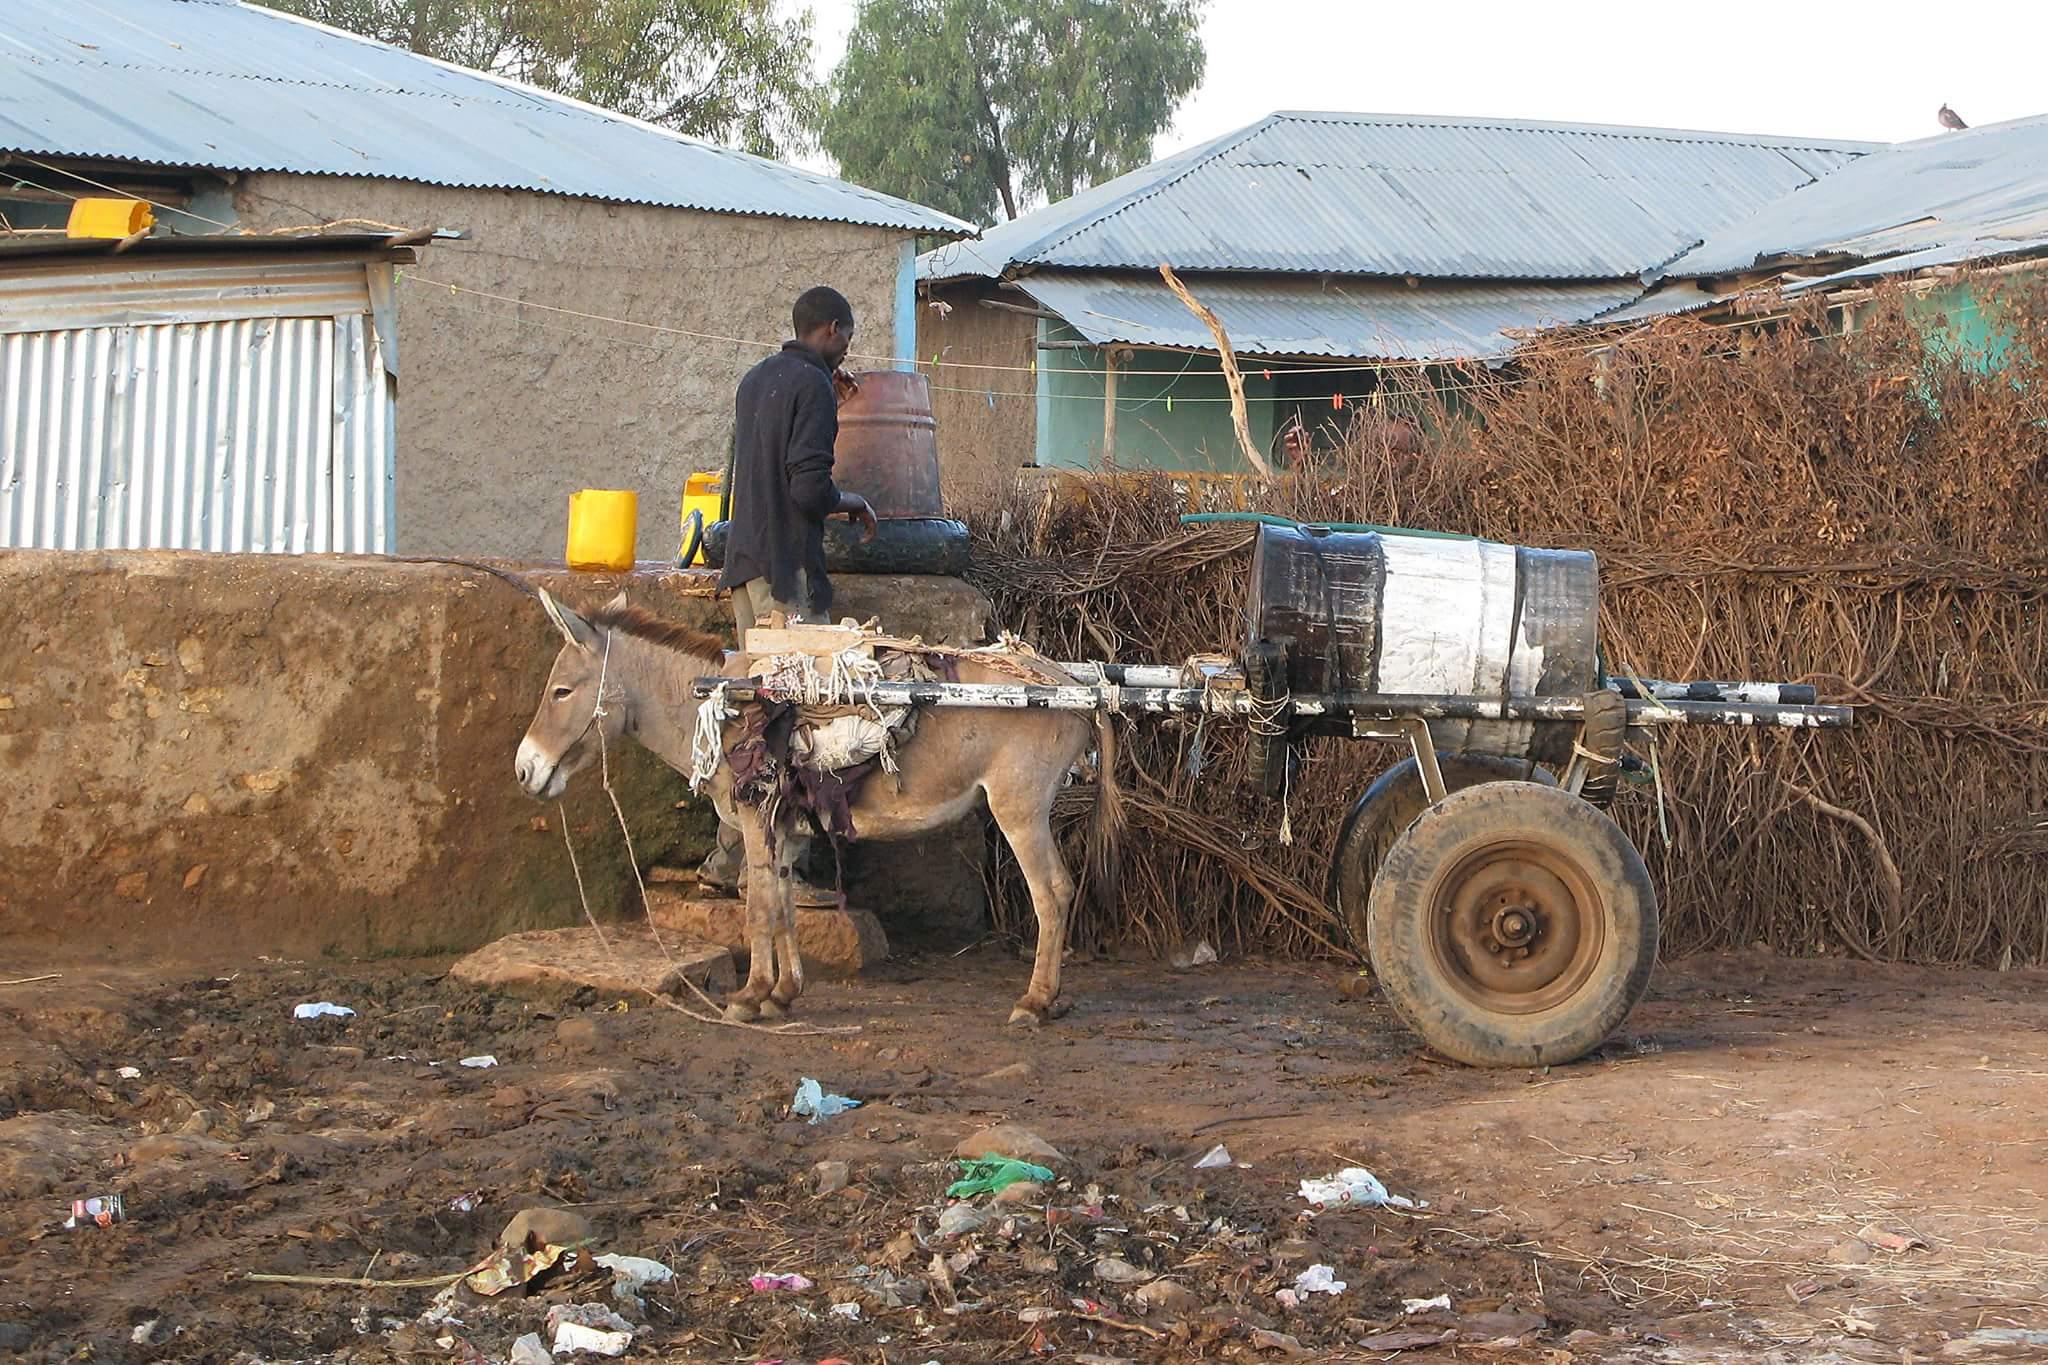 donkey carts